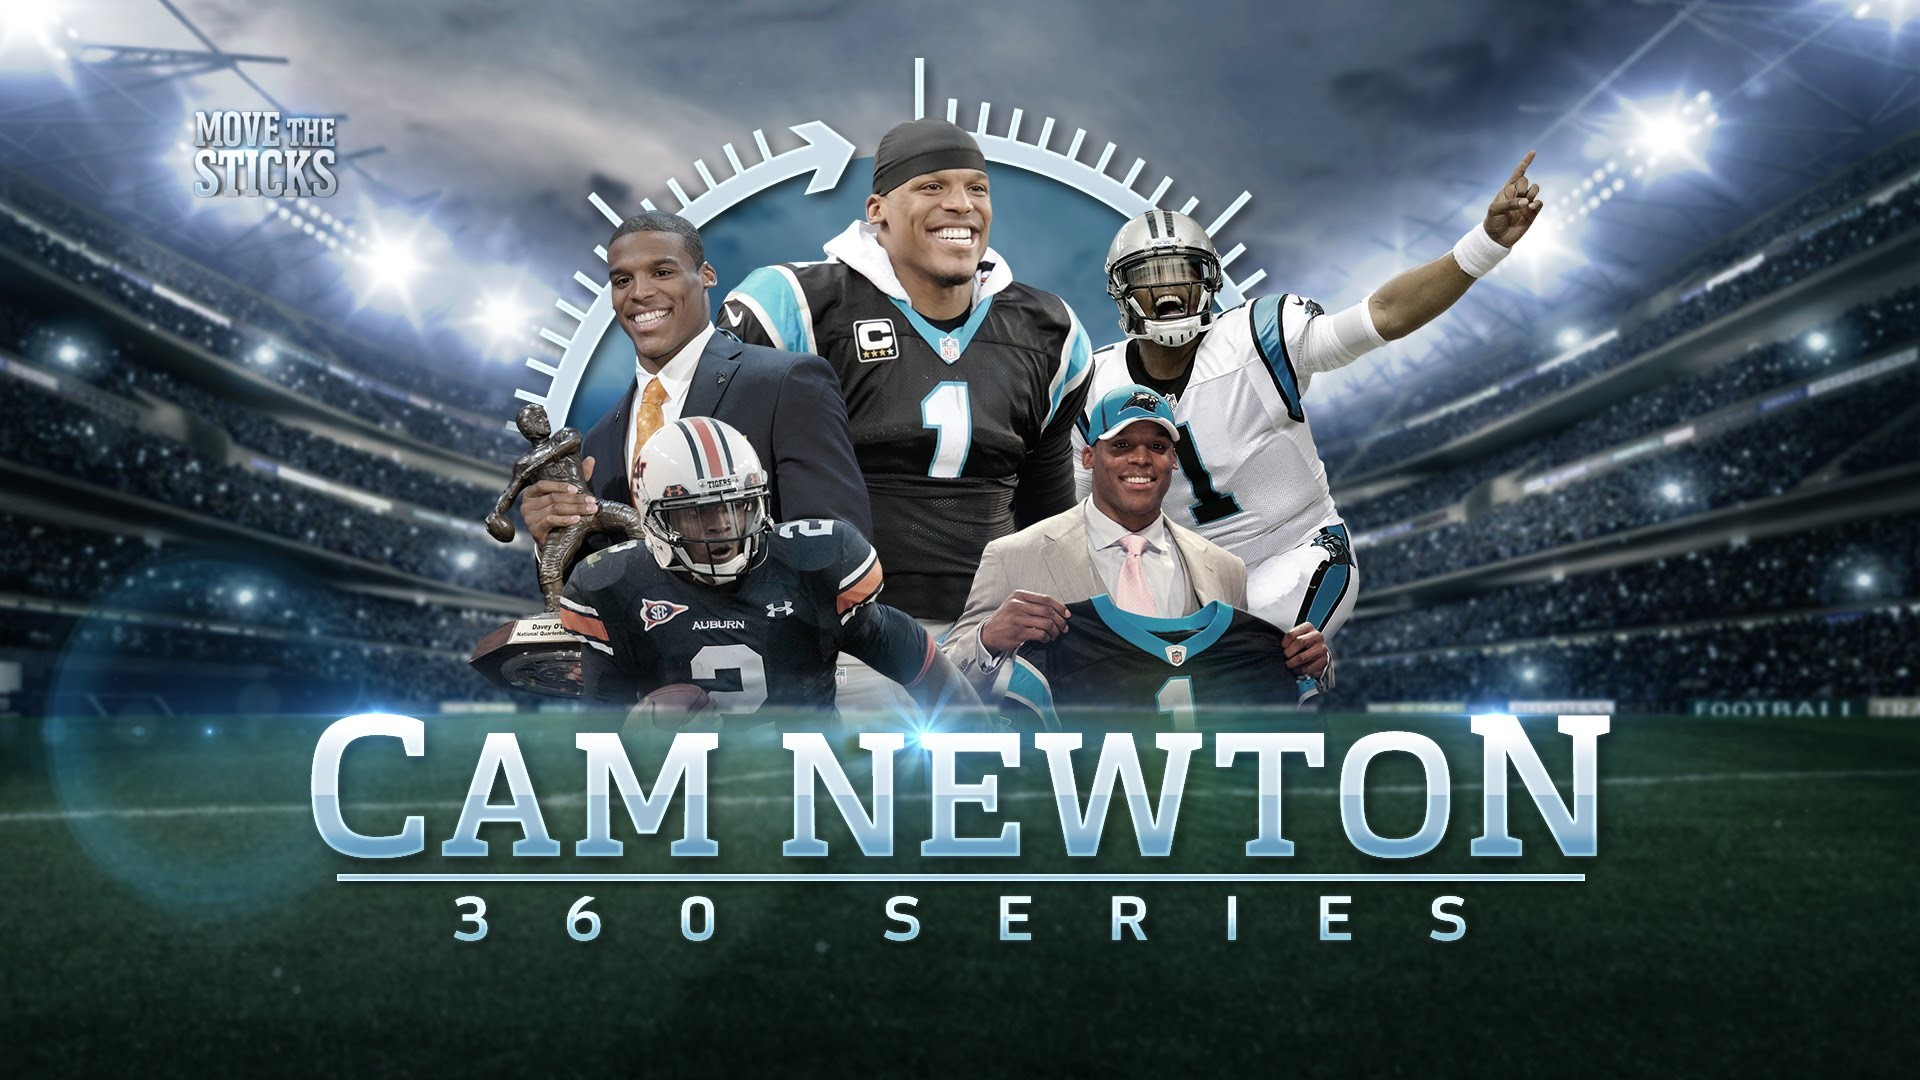 Cam Newton: From Junior College to MVP | Cam Newton 360 | Move the Sticks |  NFL